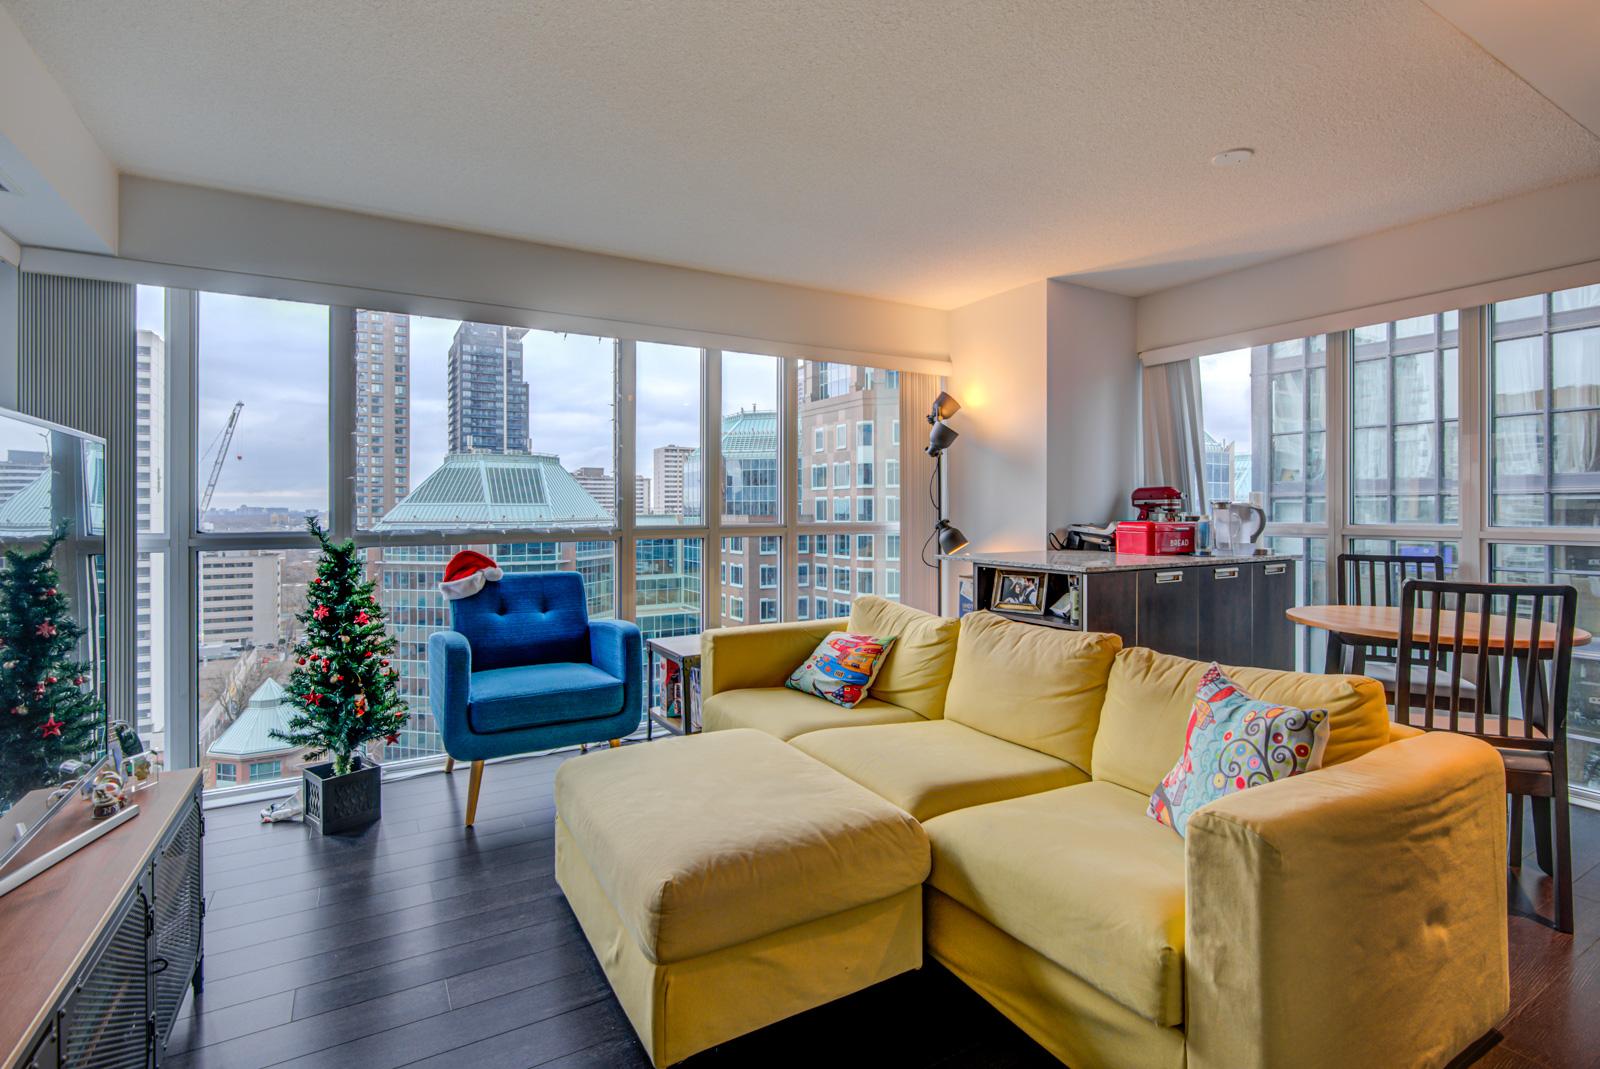 Living room with yellow sofa, blue armchair, sleek and dark laminate floors, and huge windows.